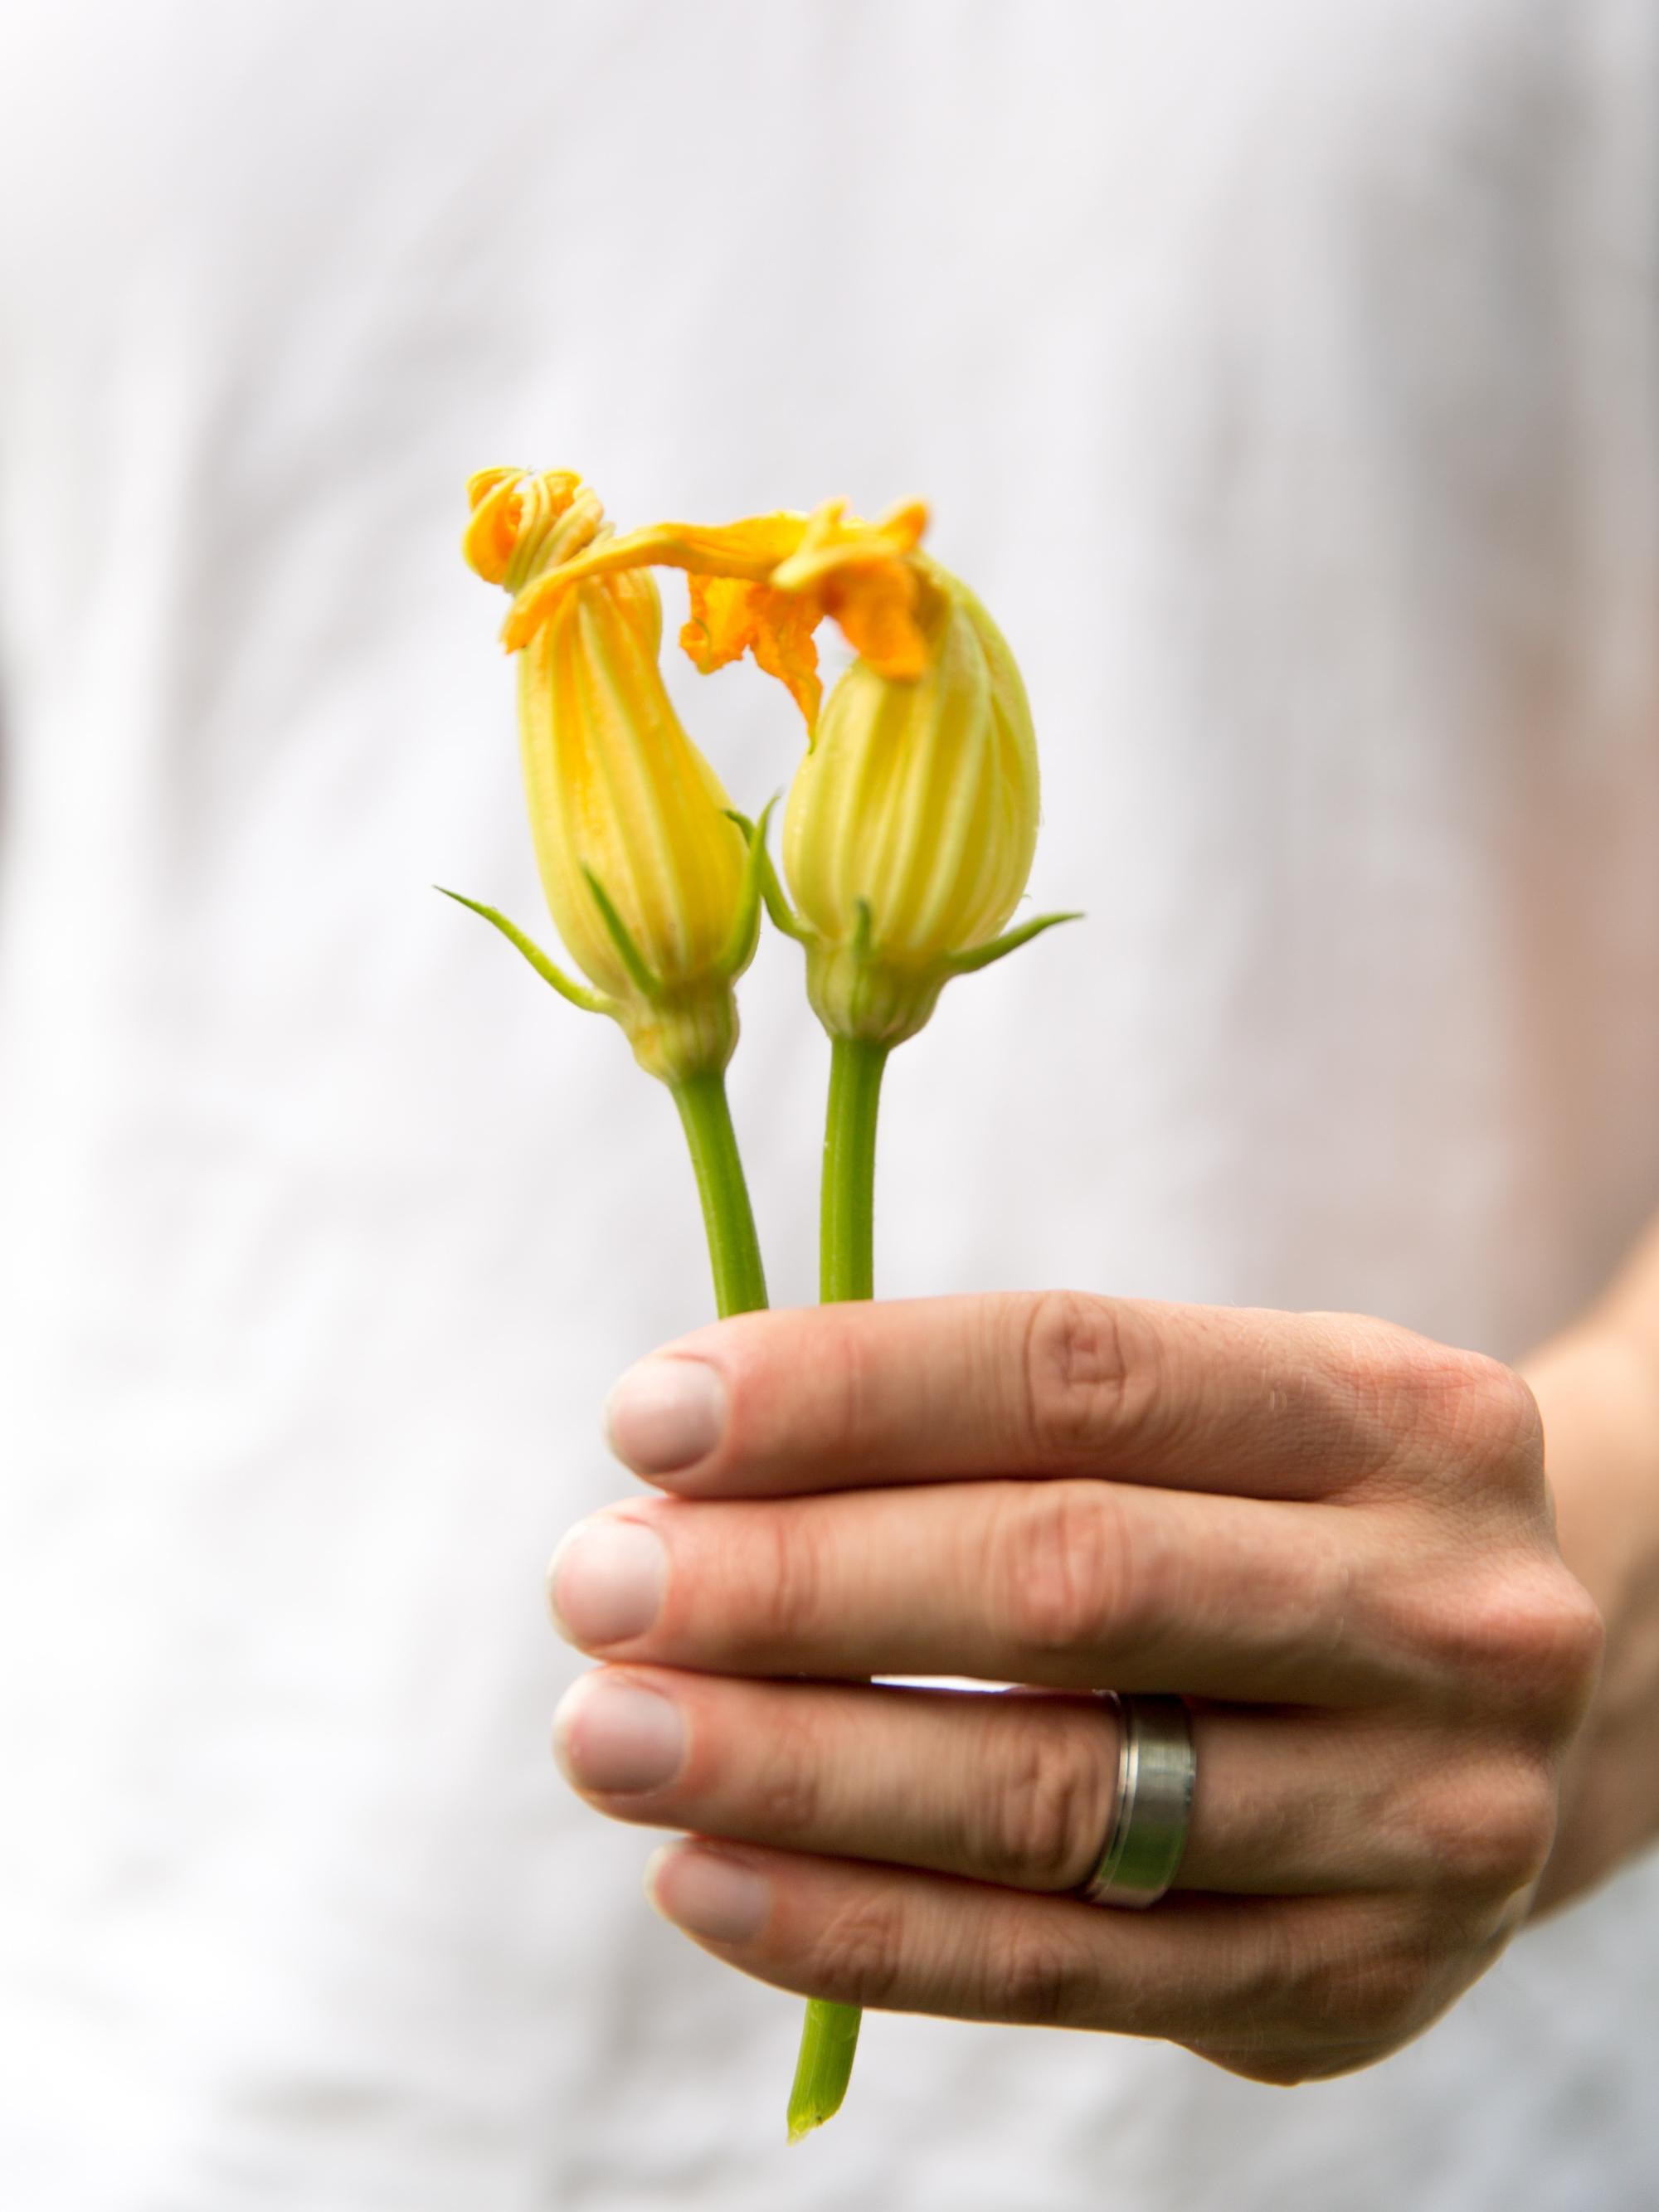 Squash Blossom From Garden